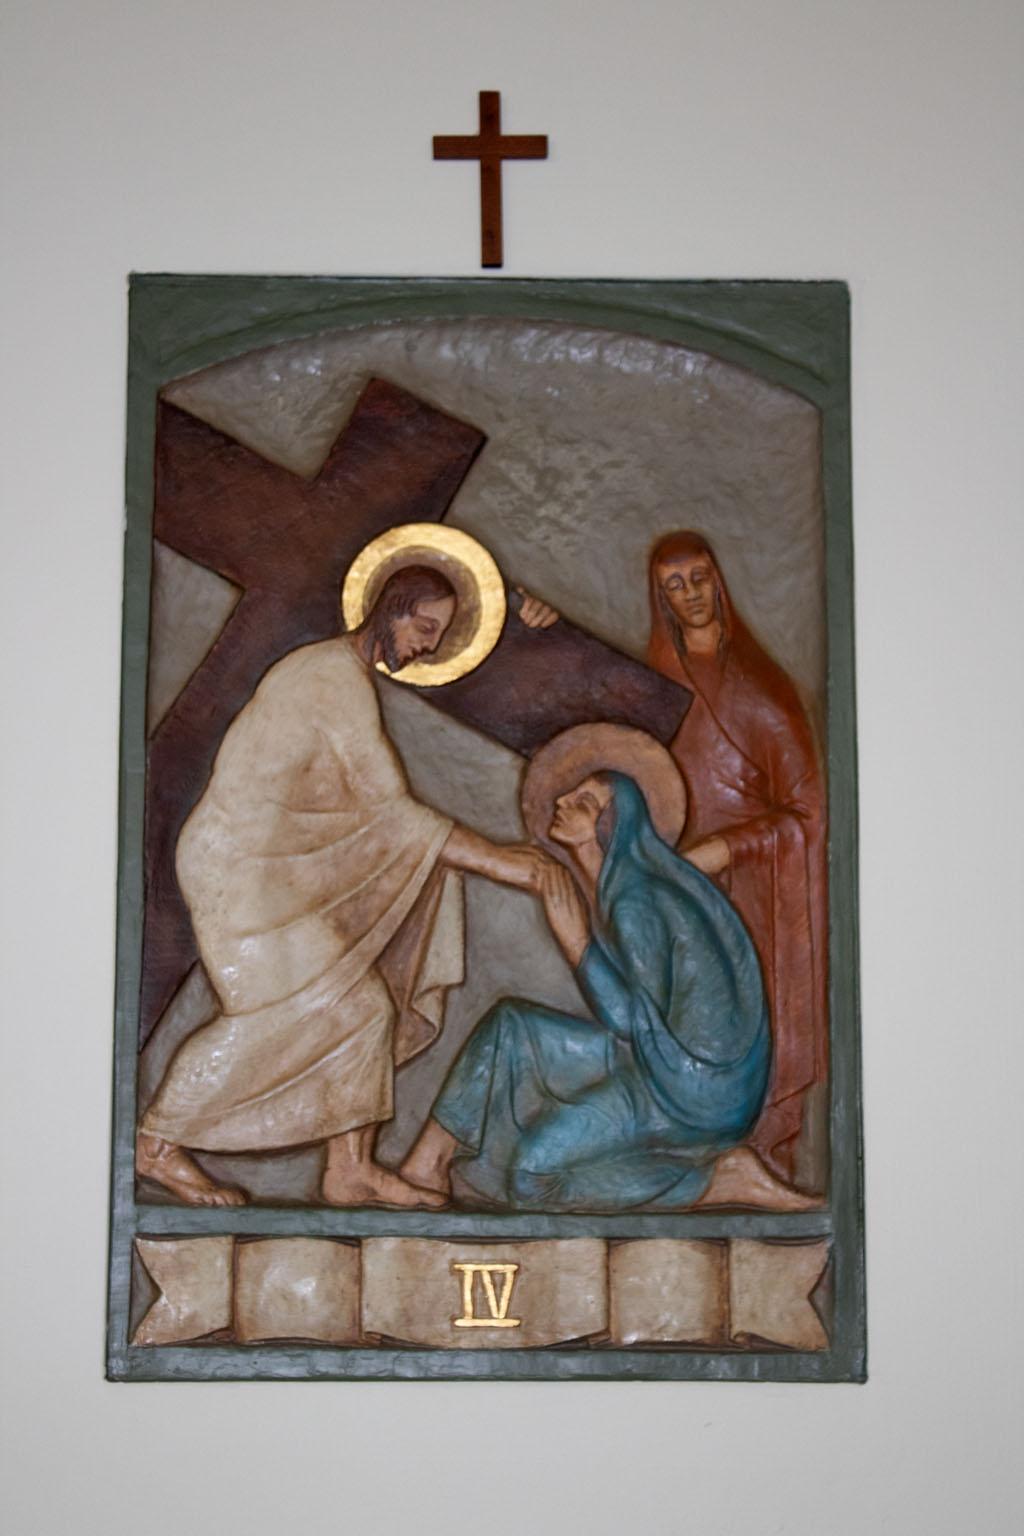 Fourth Station of the cross by Dora de Pédery Hunt